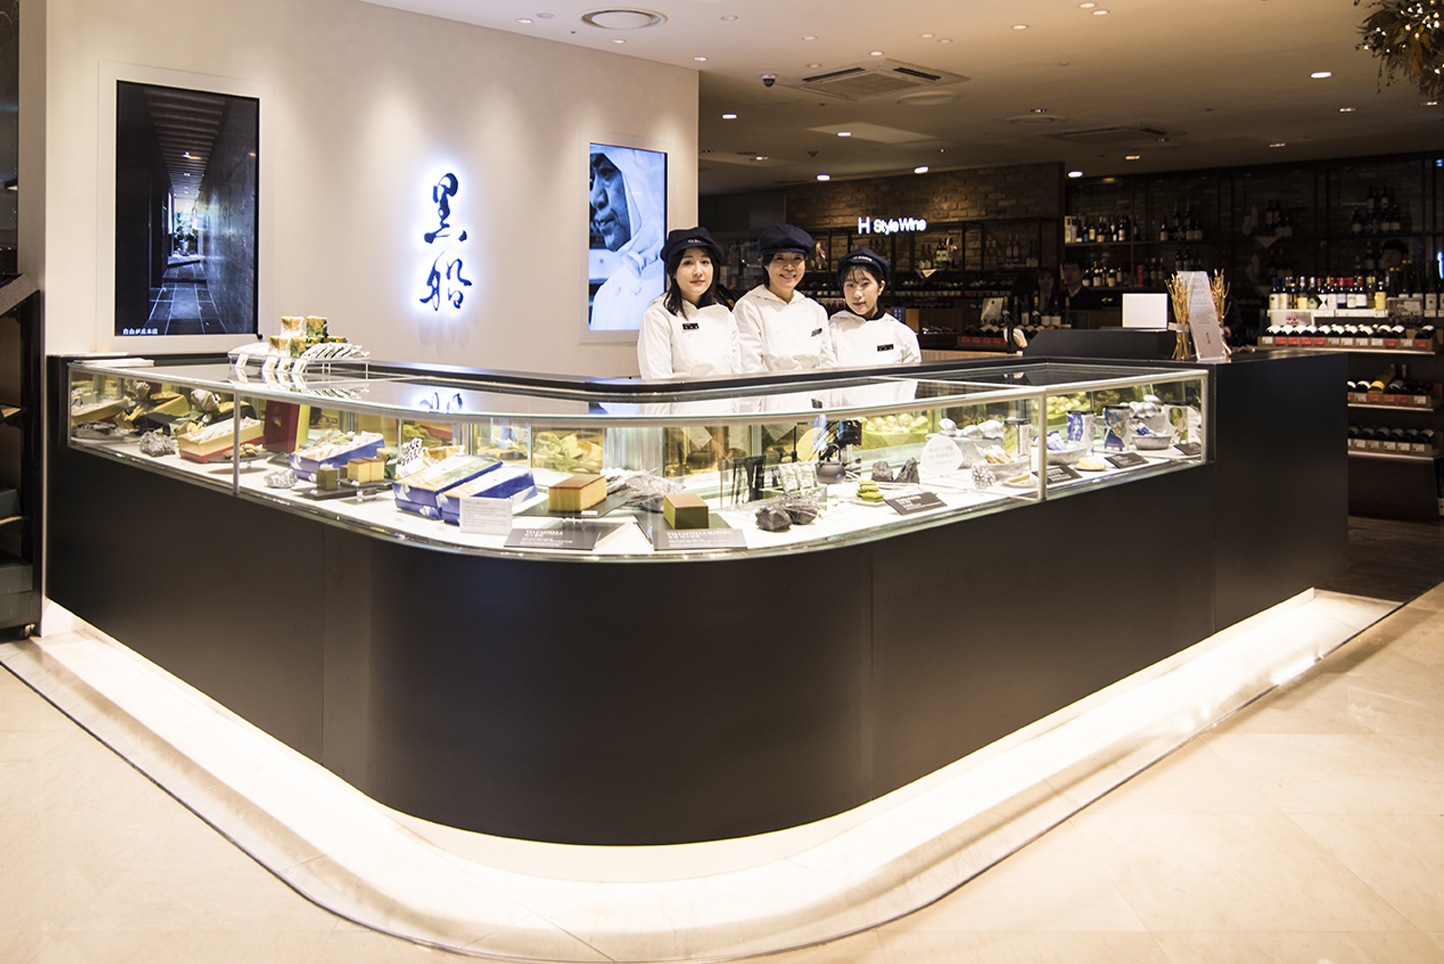 Korea Hyundai Department Store Apgujeong Main shop